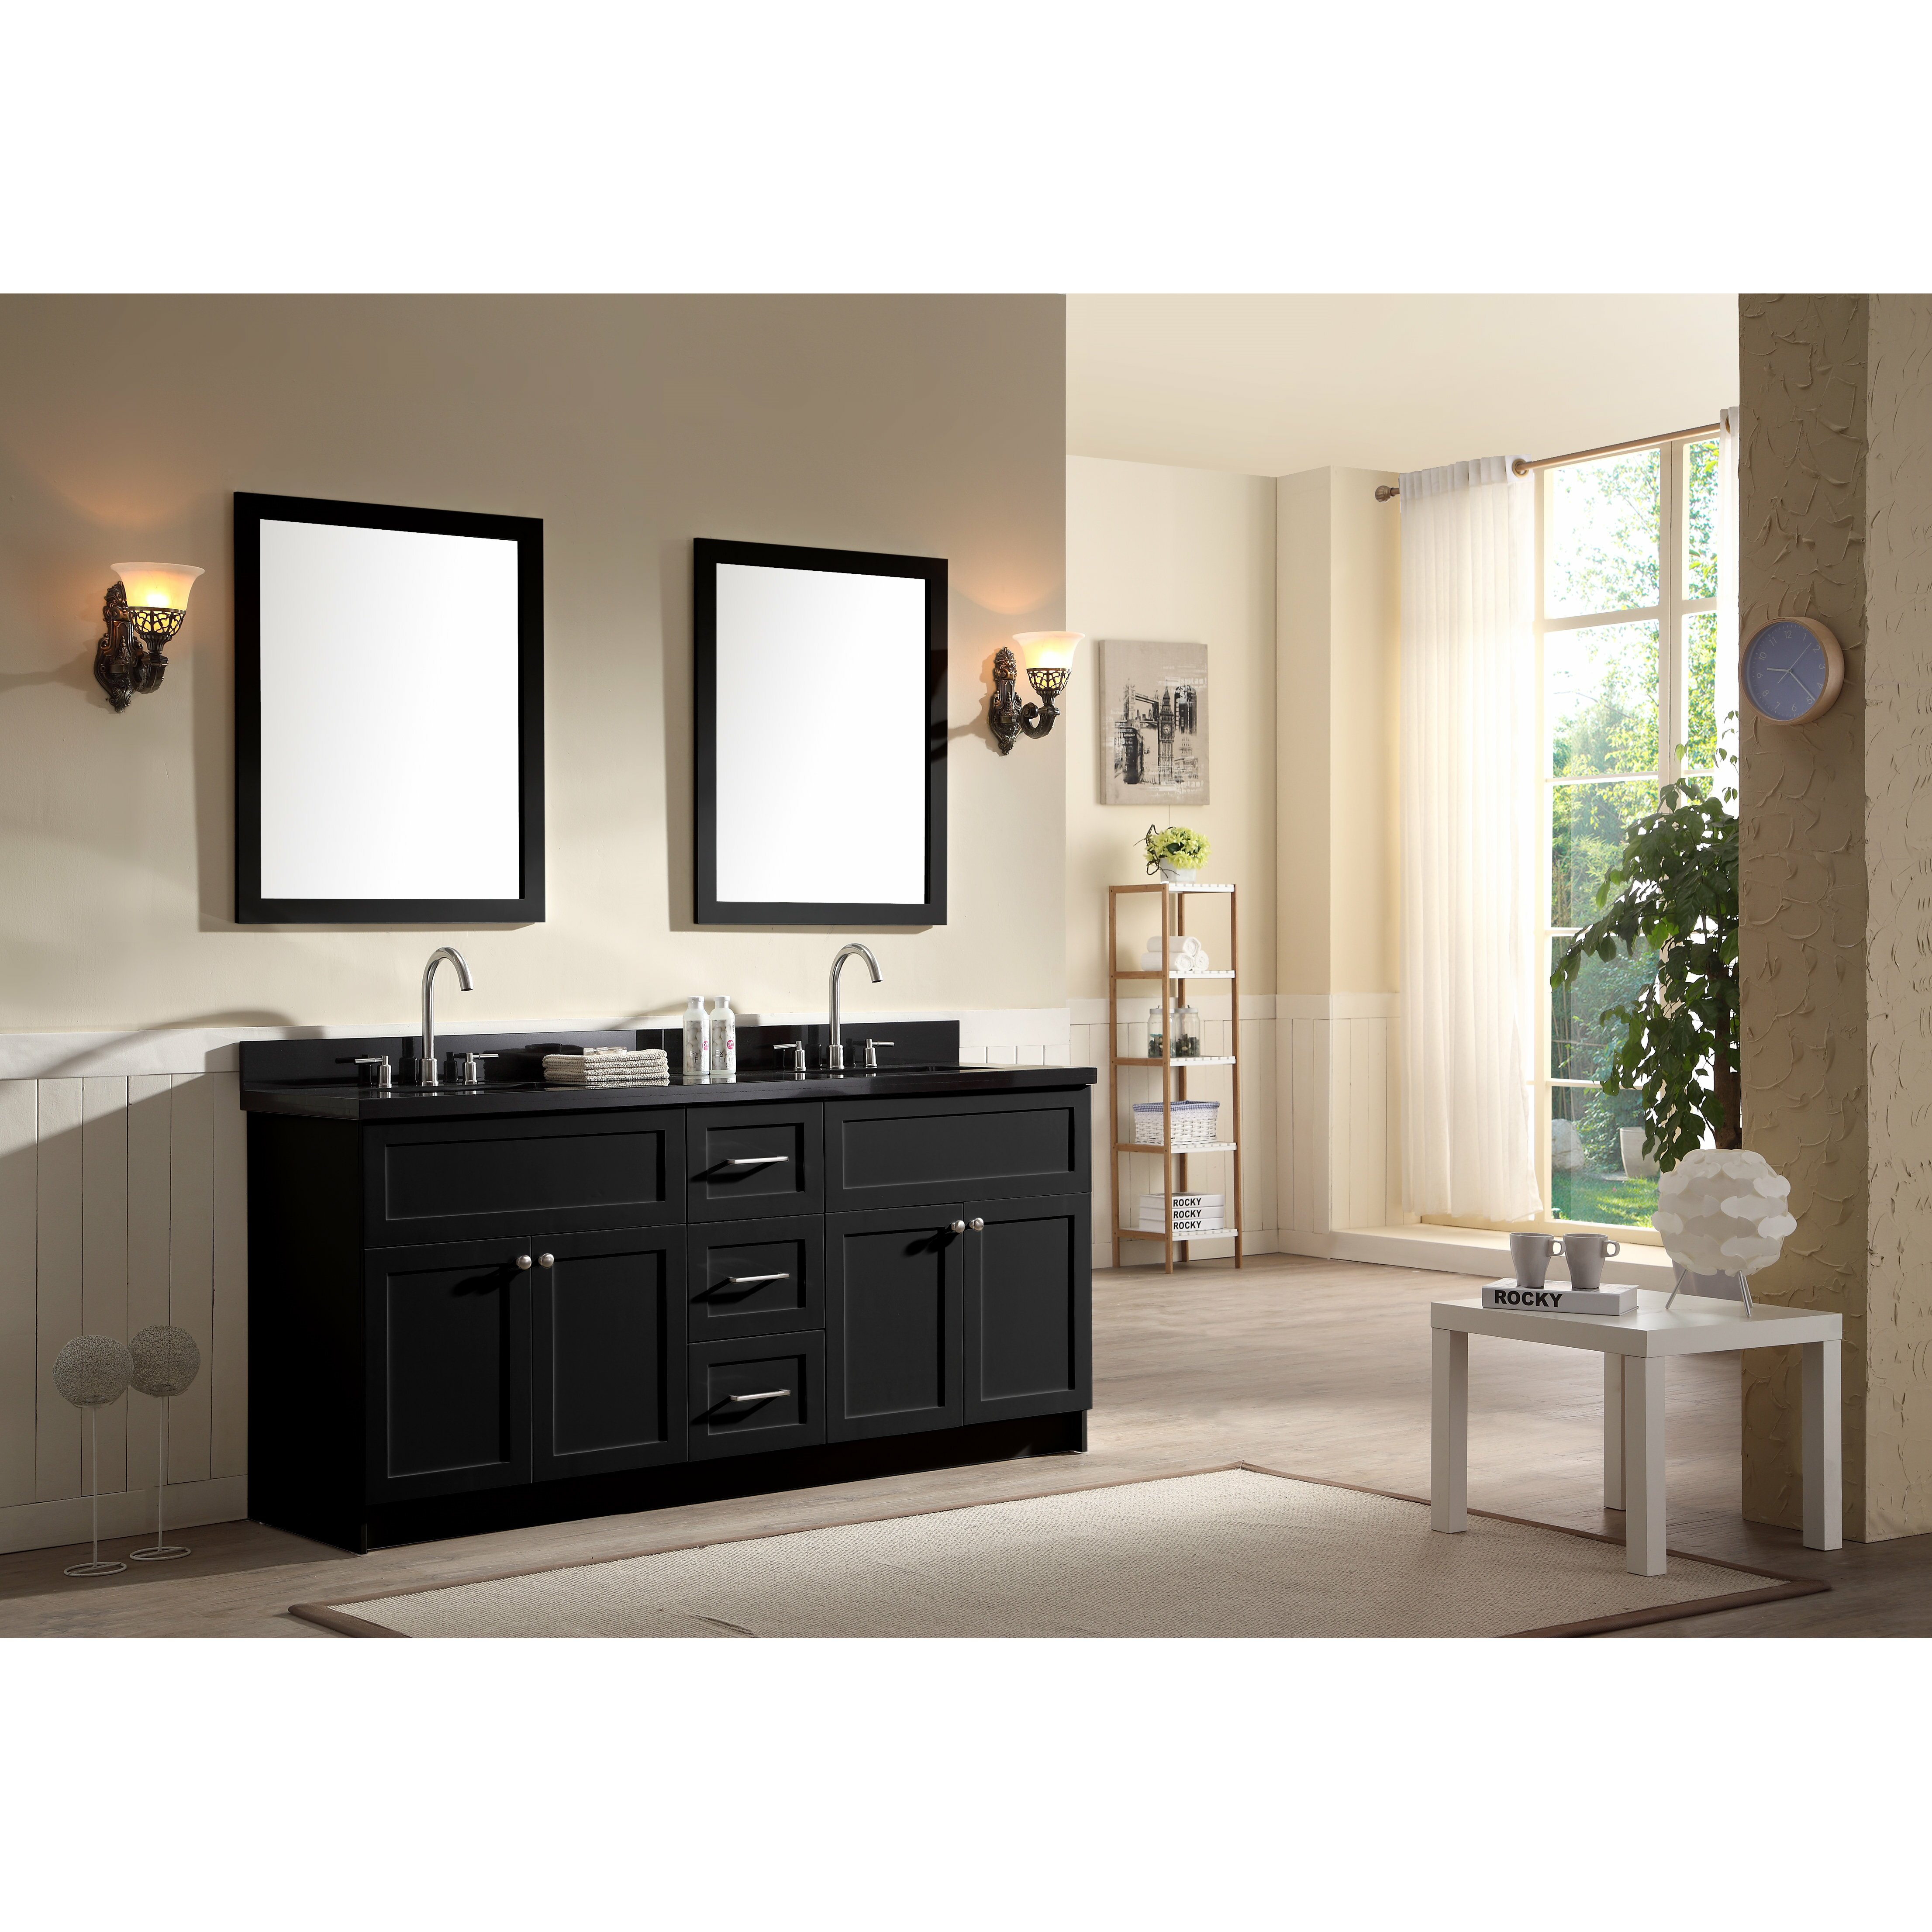 Ariel Bath Hamlet 73 Double Bathroom Vanity Set With